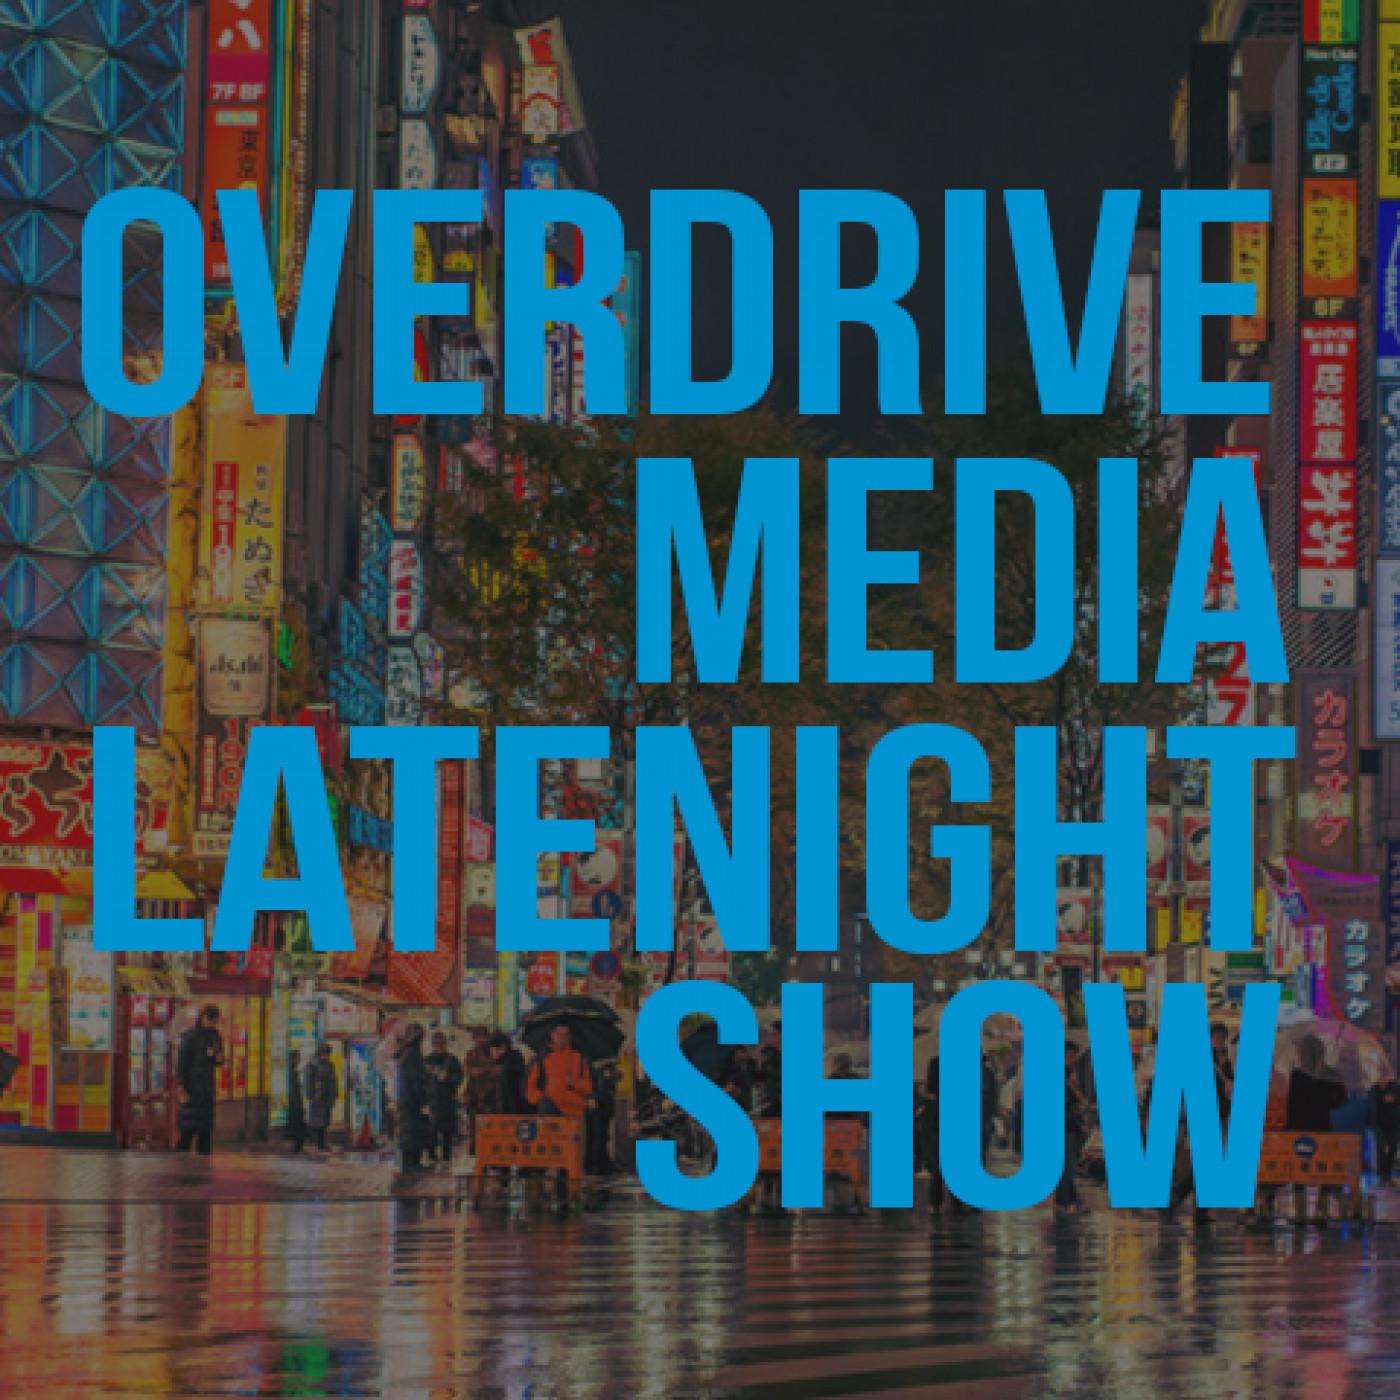 Latenight Show de OM - Adios 2018 en Overdrive Media